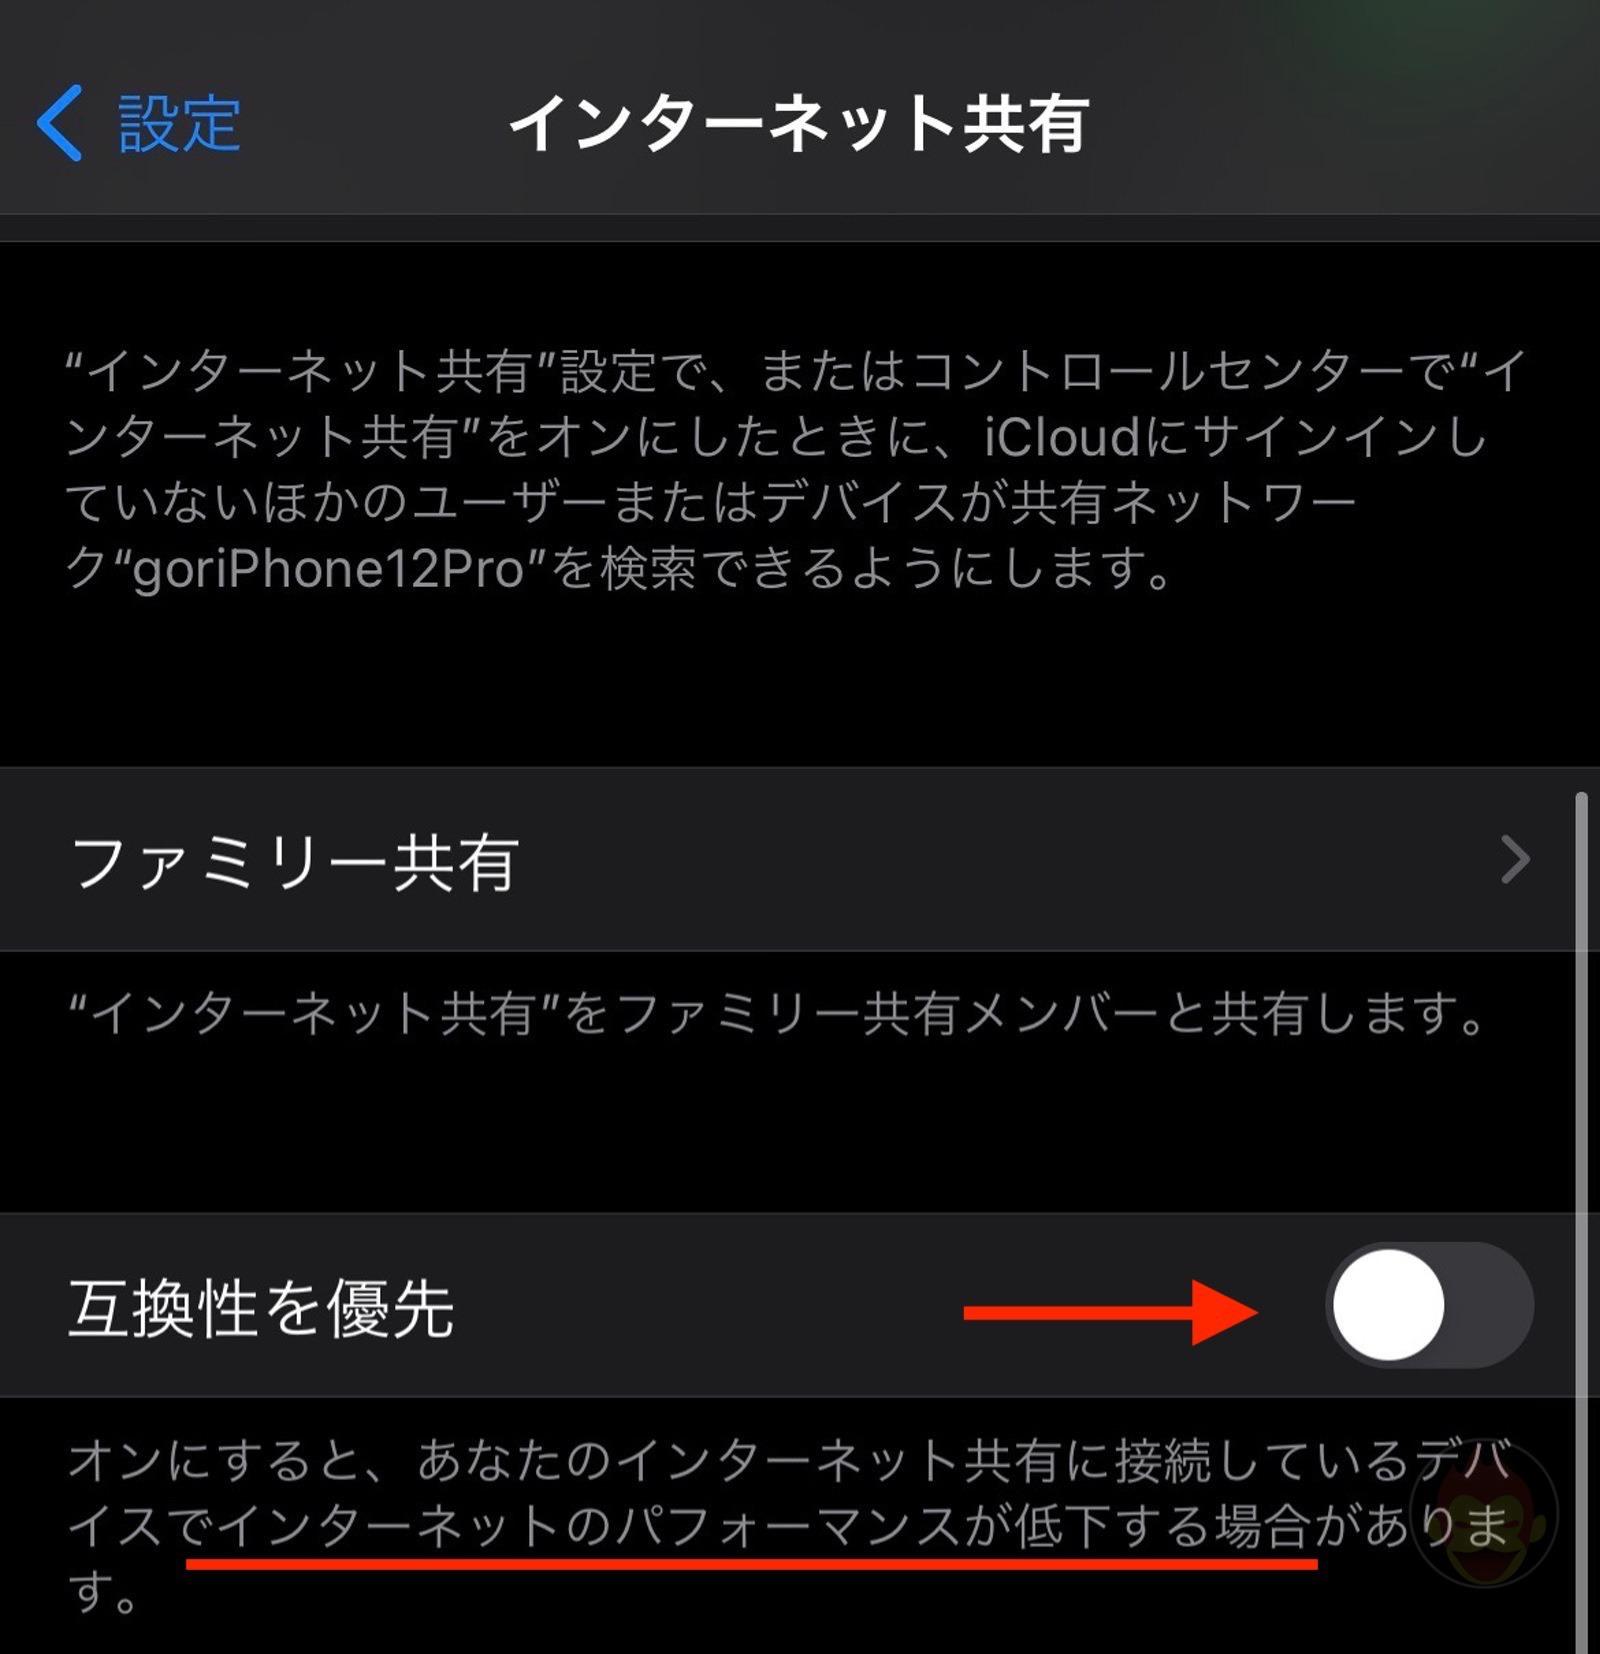 Iphone12 tethering settings 01